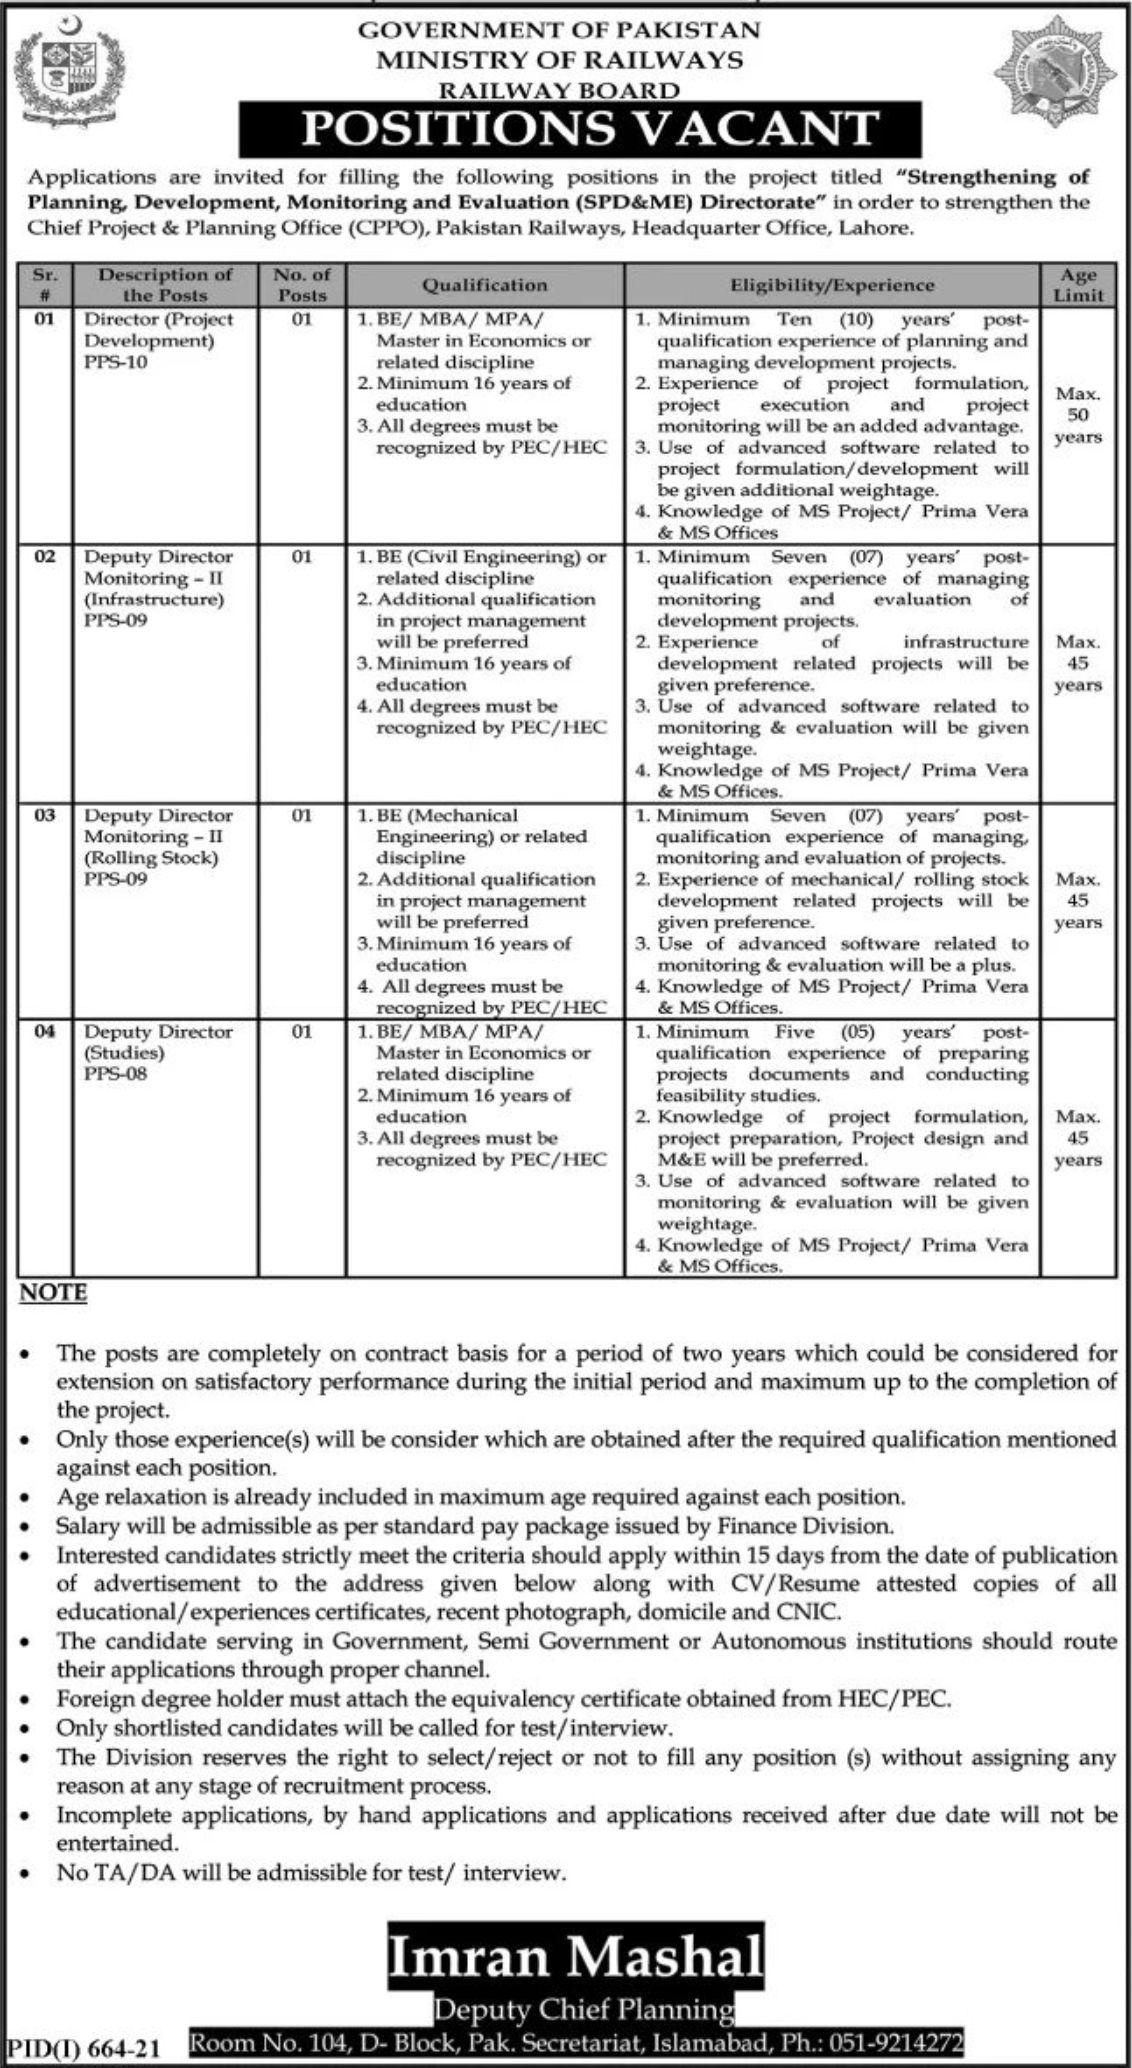 Government of Pakistan Ministry of Railways Vacancies 2021 3